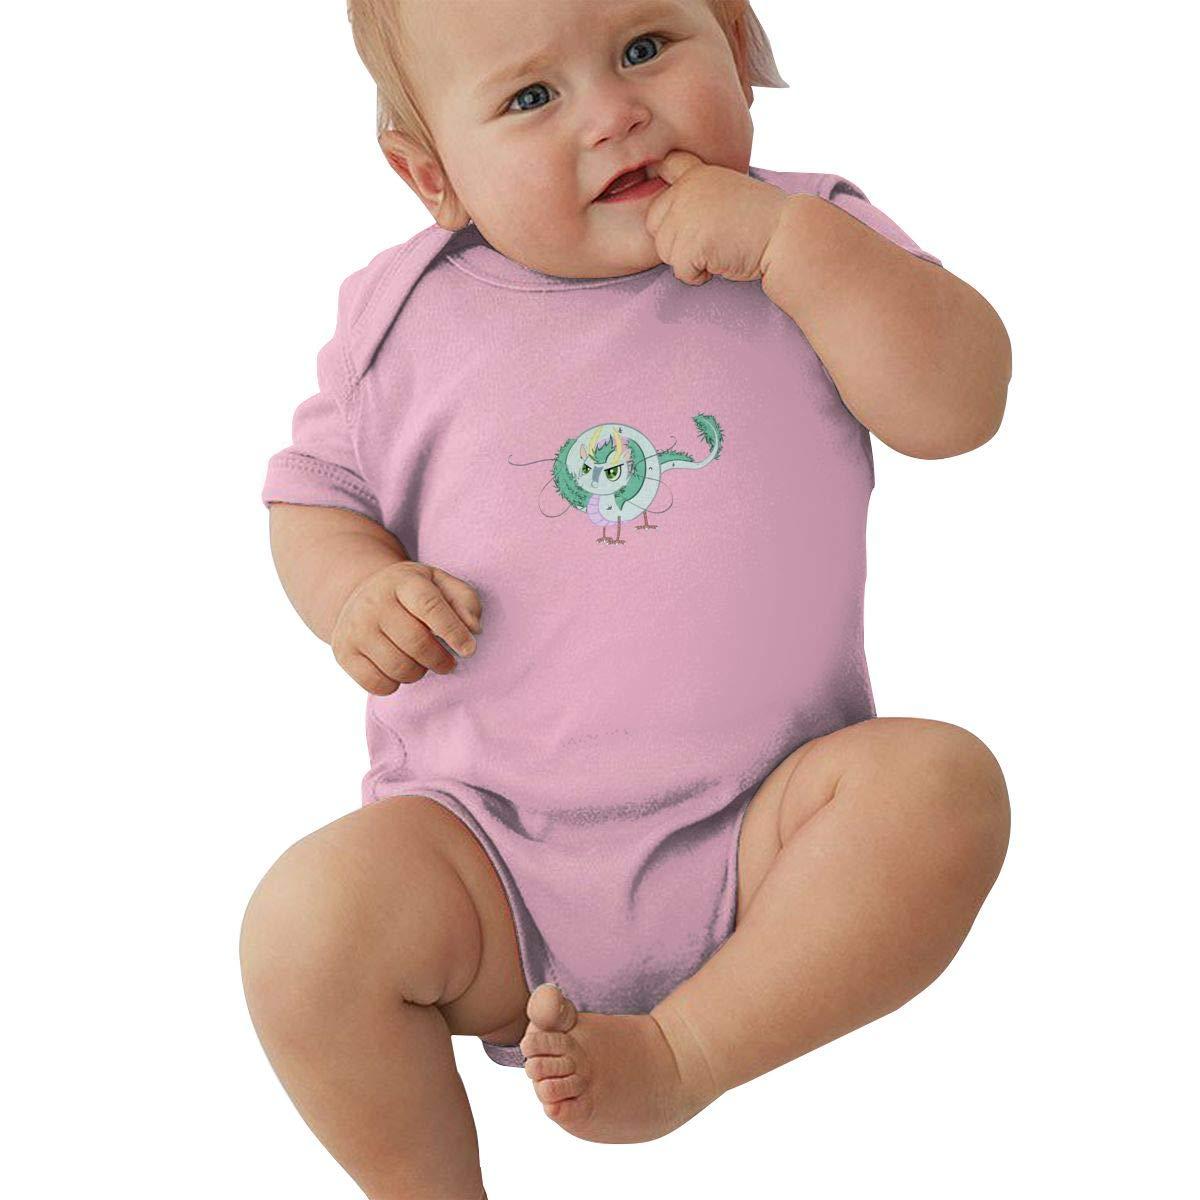 HuoFengDing Haku Soft Romper for Baby Girl Black